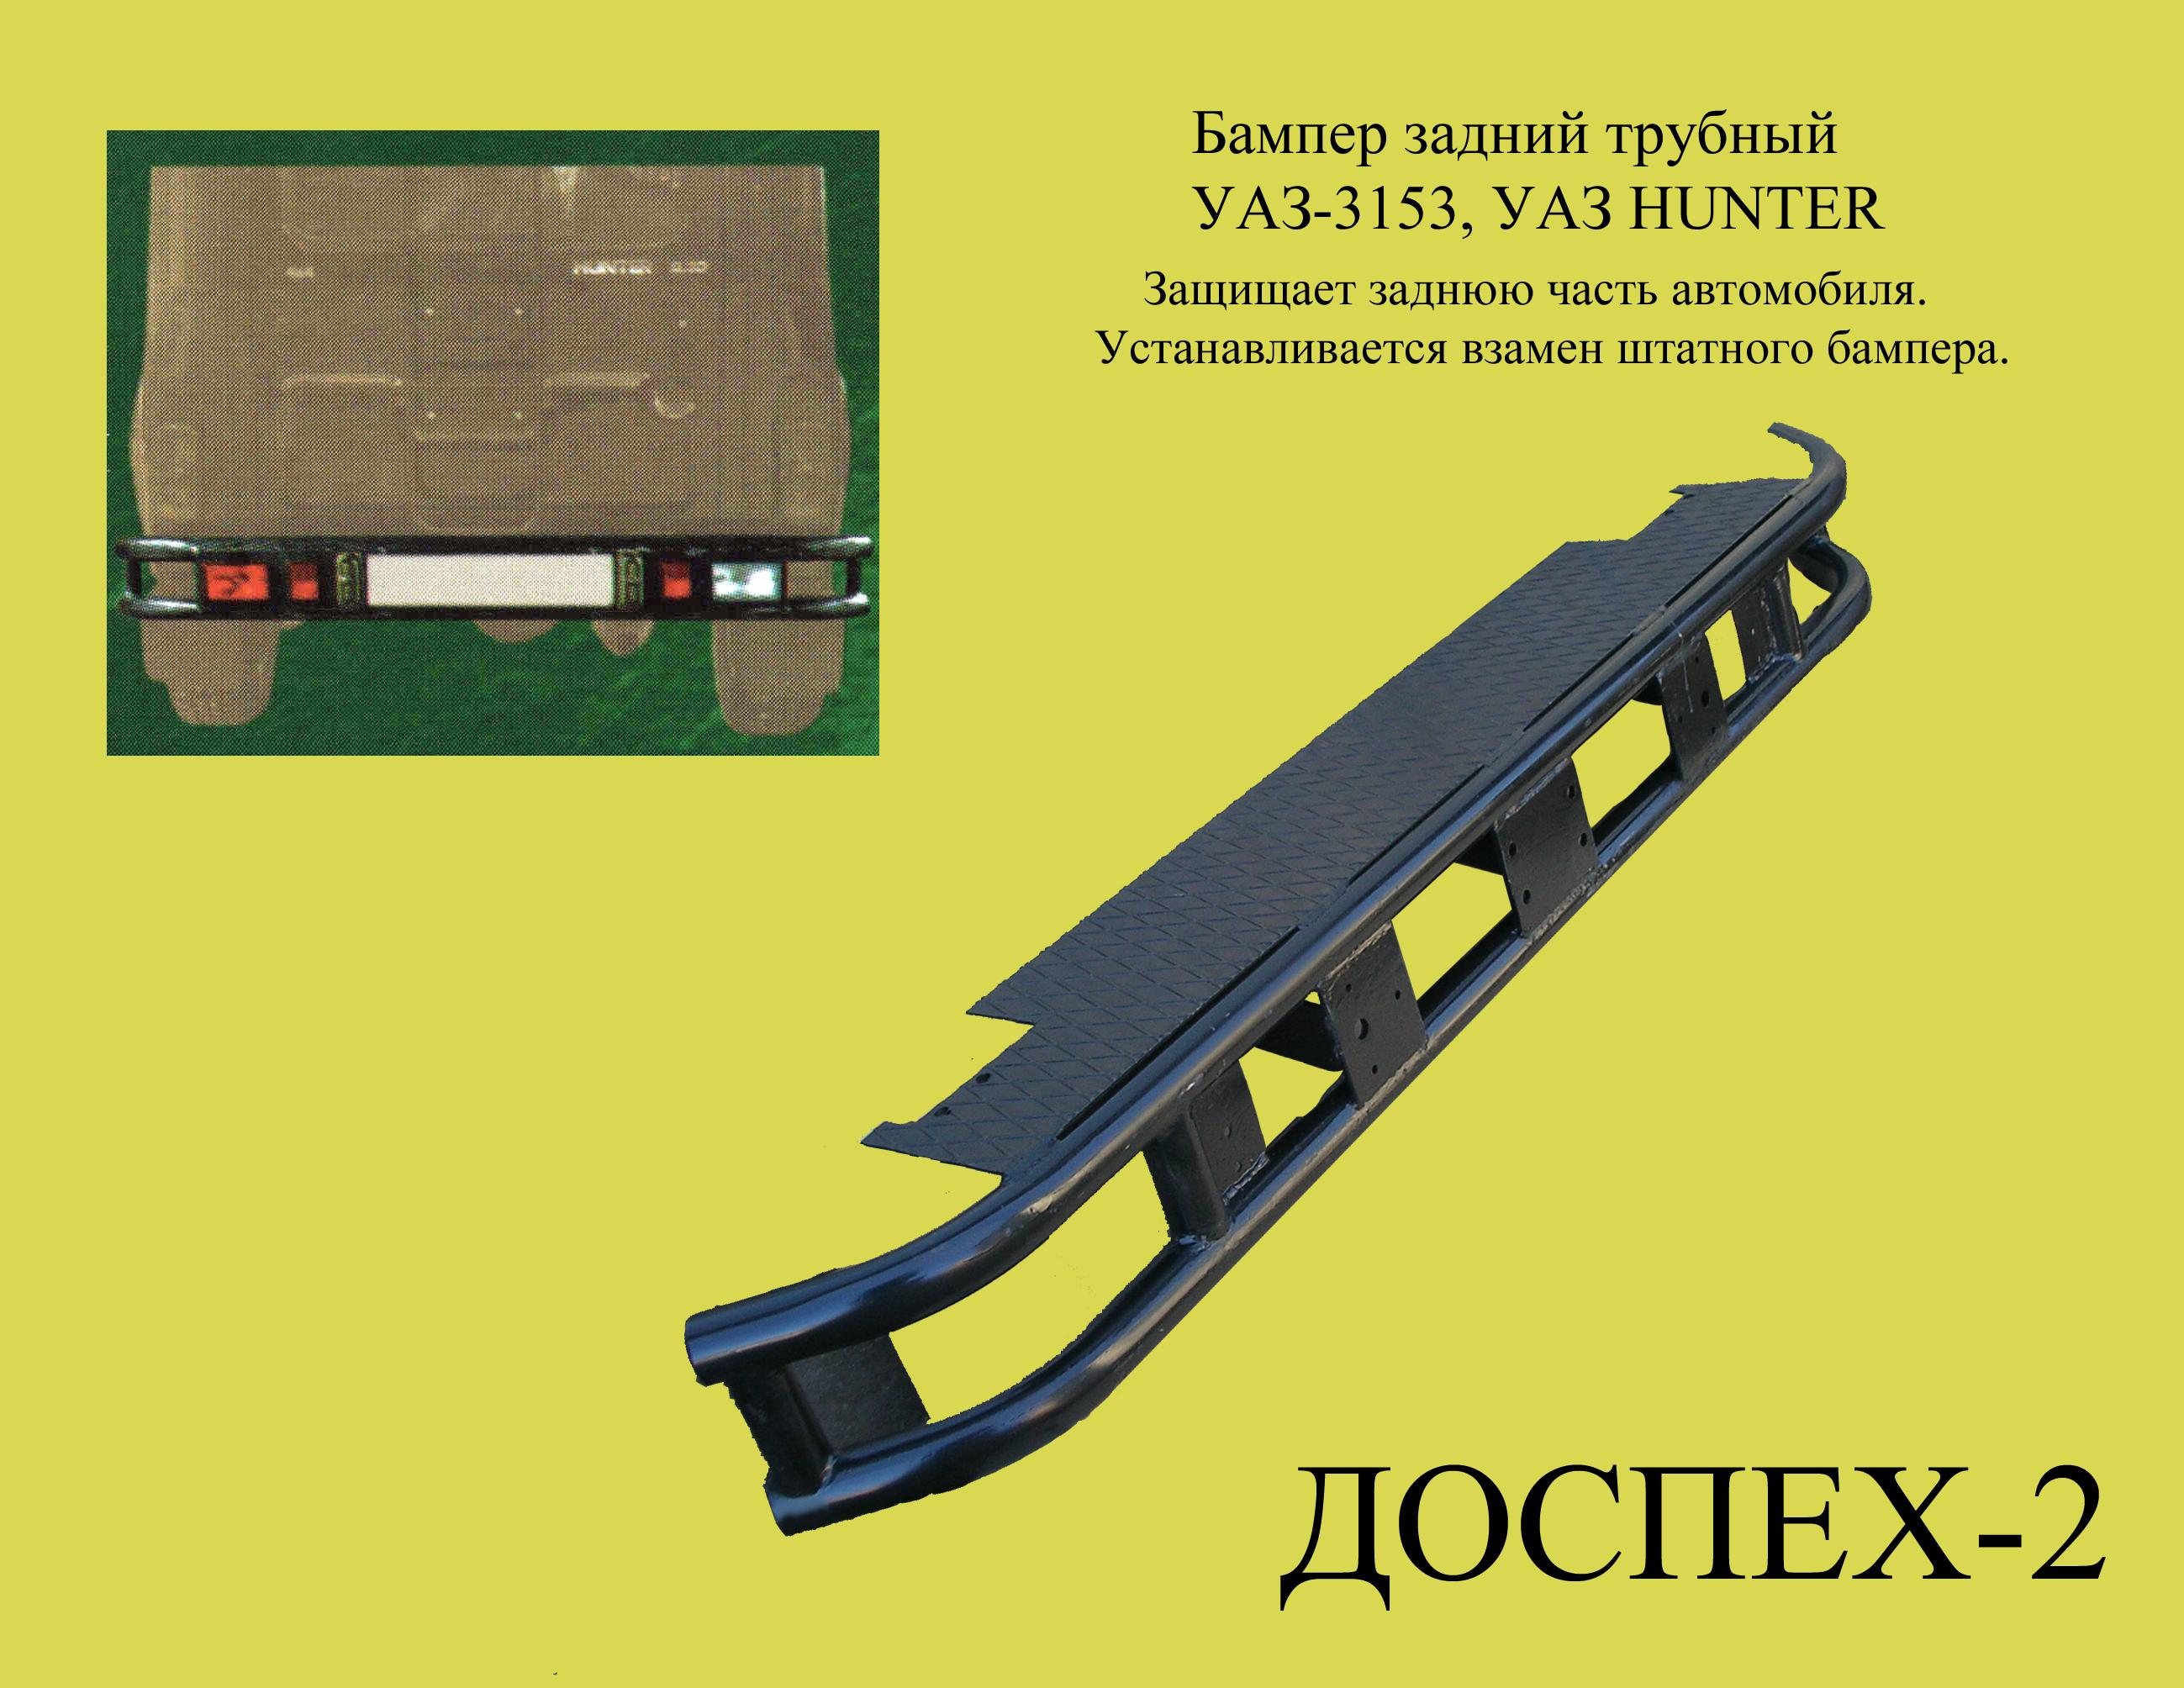 Силовой бампер на уаз хантер чертежи задний